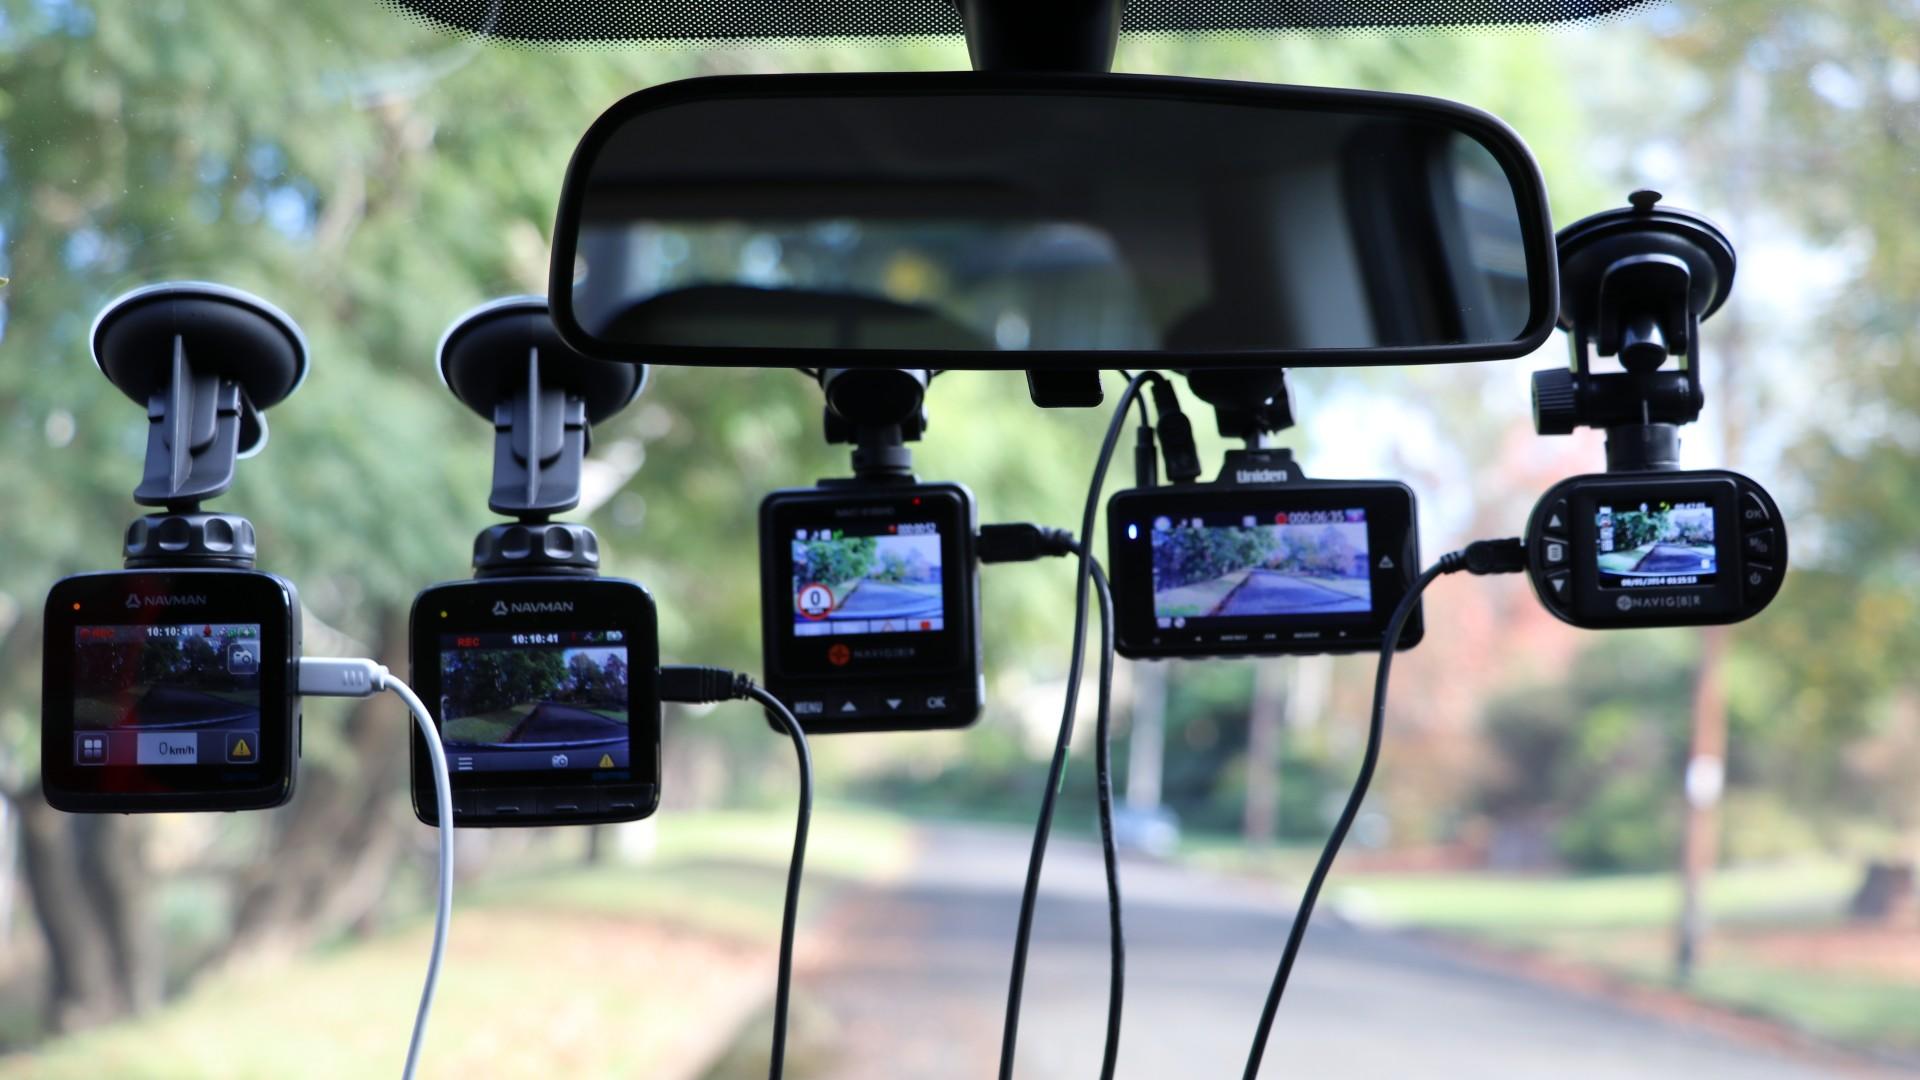 dash cam showdown six cams reviewed eftm. Black Bedroom Furniture Sets. Home Design Ideas